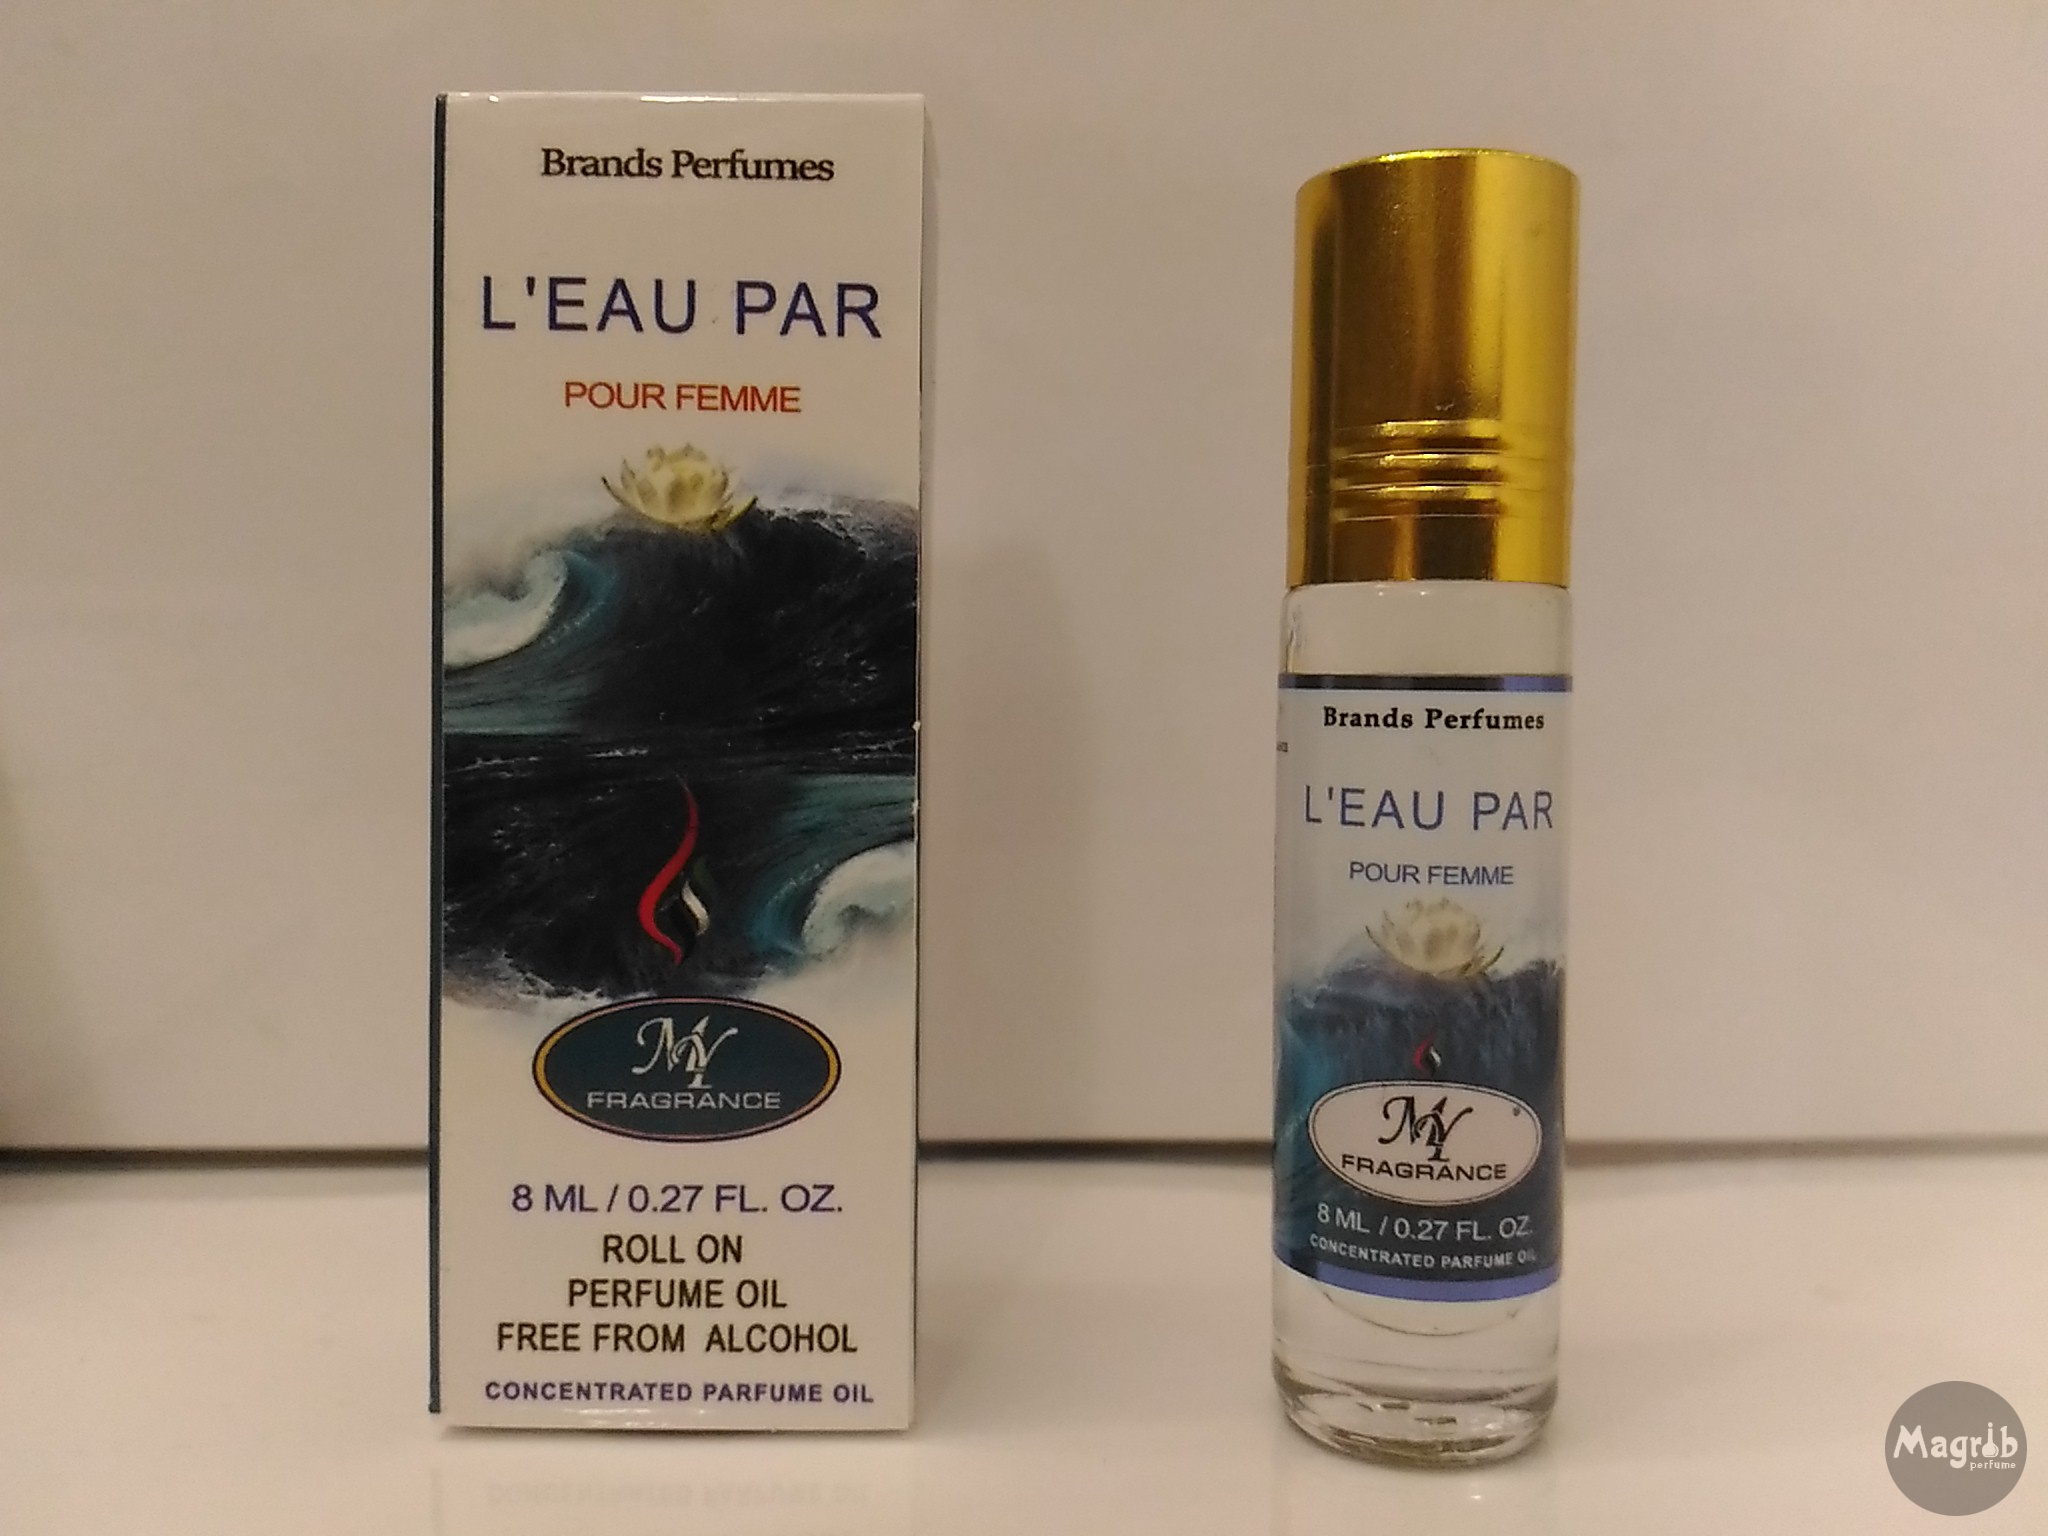 Ravza Kenzo L'eau Par 8ml - унисекс, масляные духи